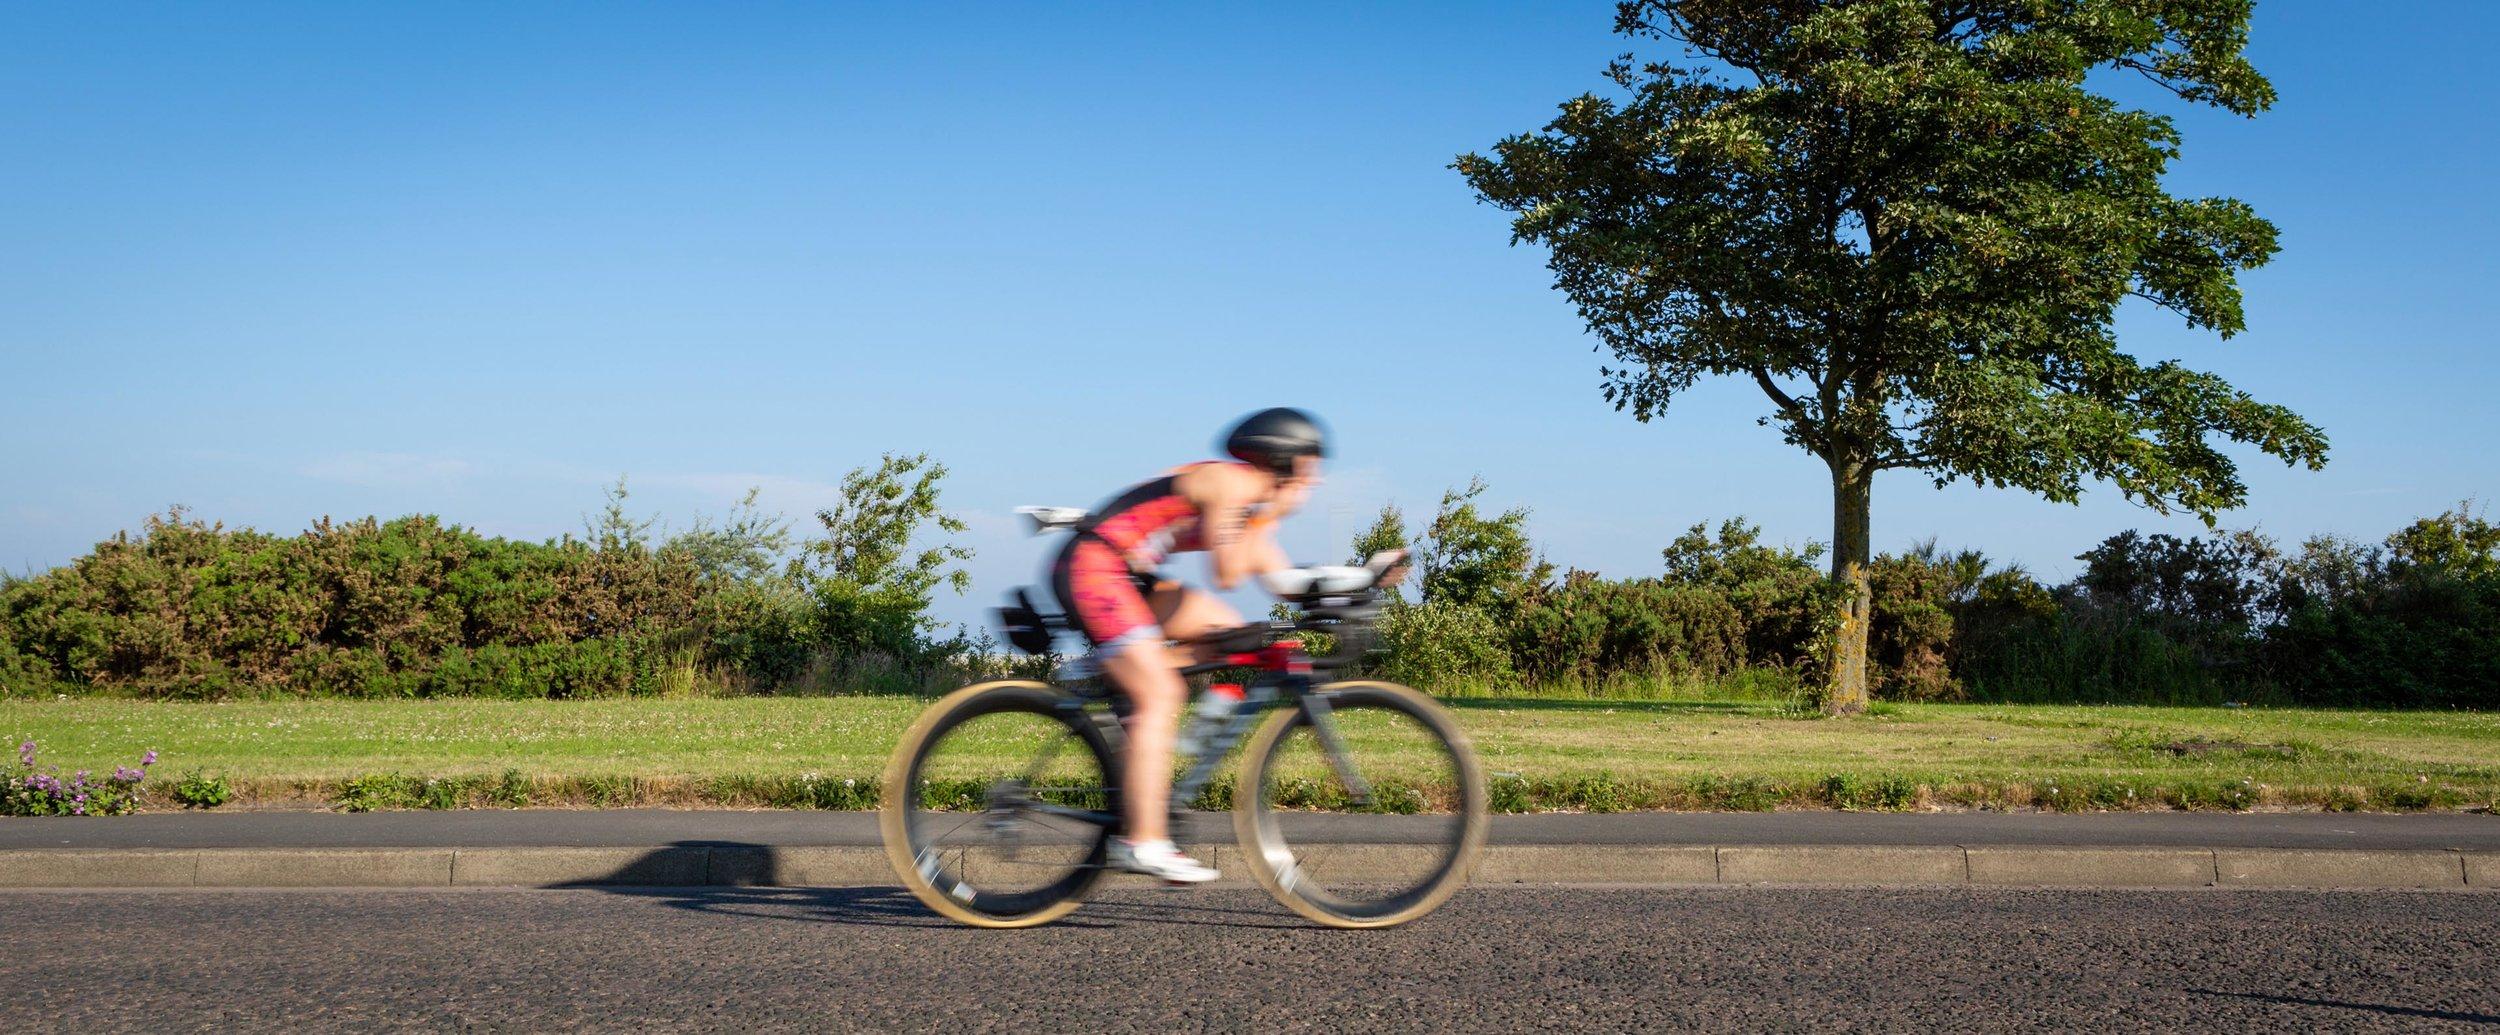 Ironman Speed Cyclist.jpg